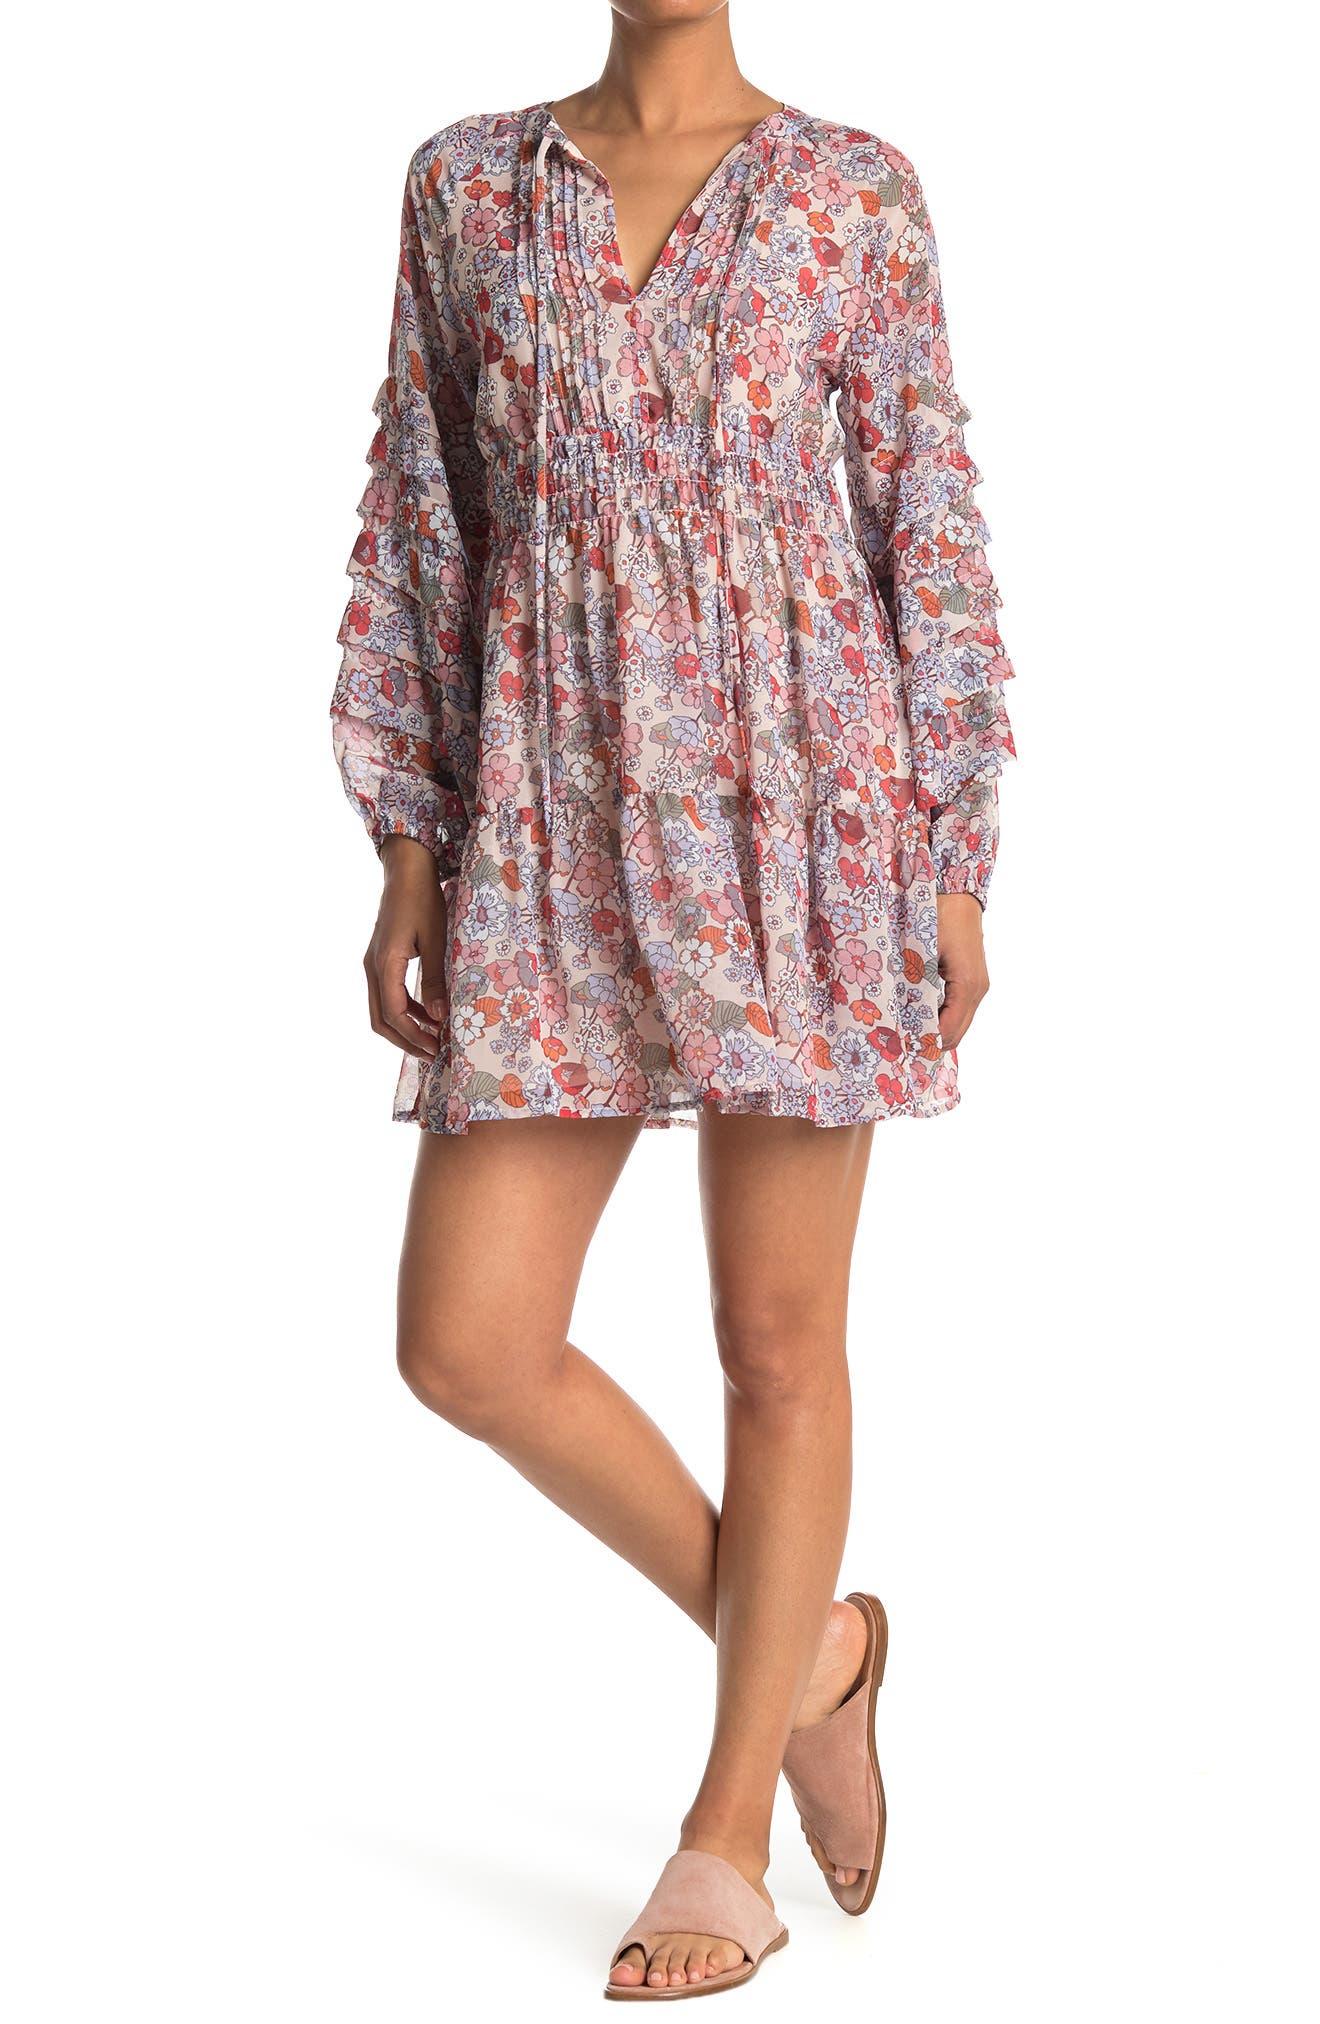 Image of North and Co Vintage Floral Biba Dress